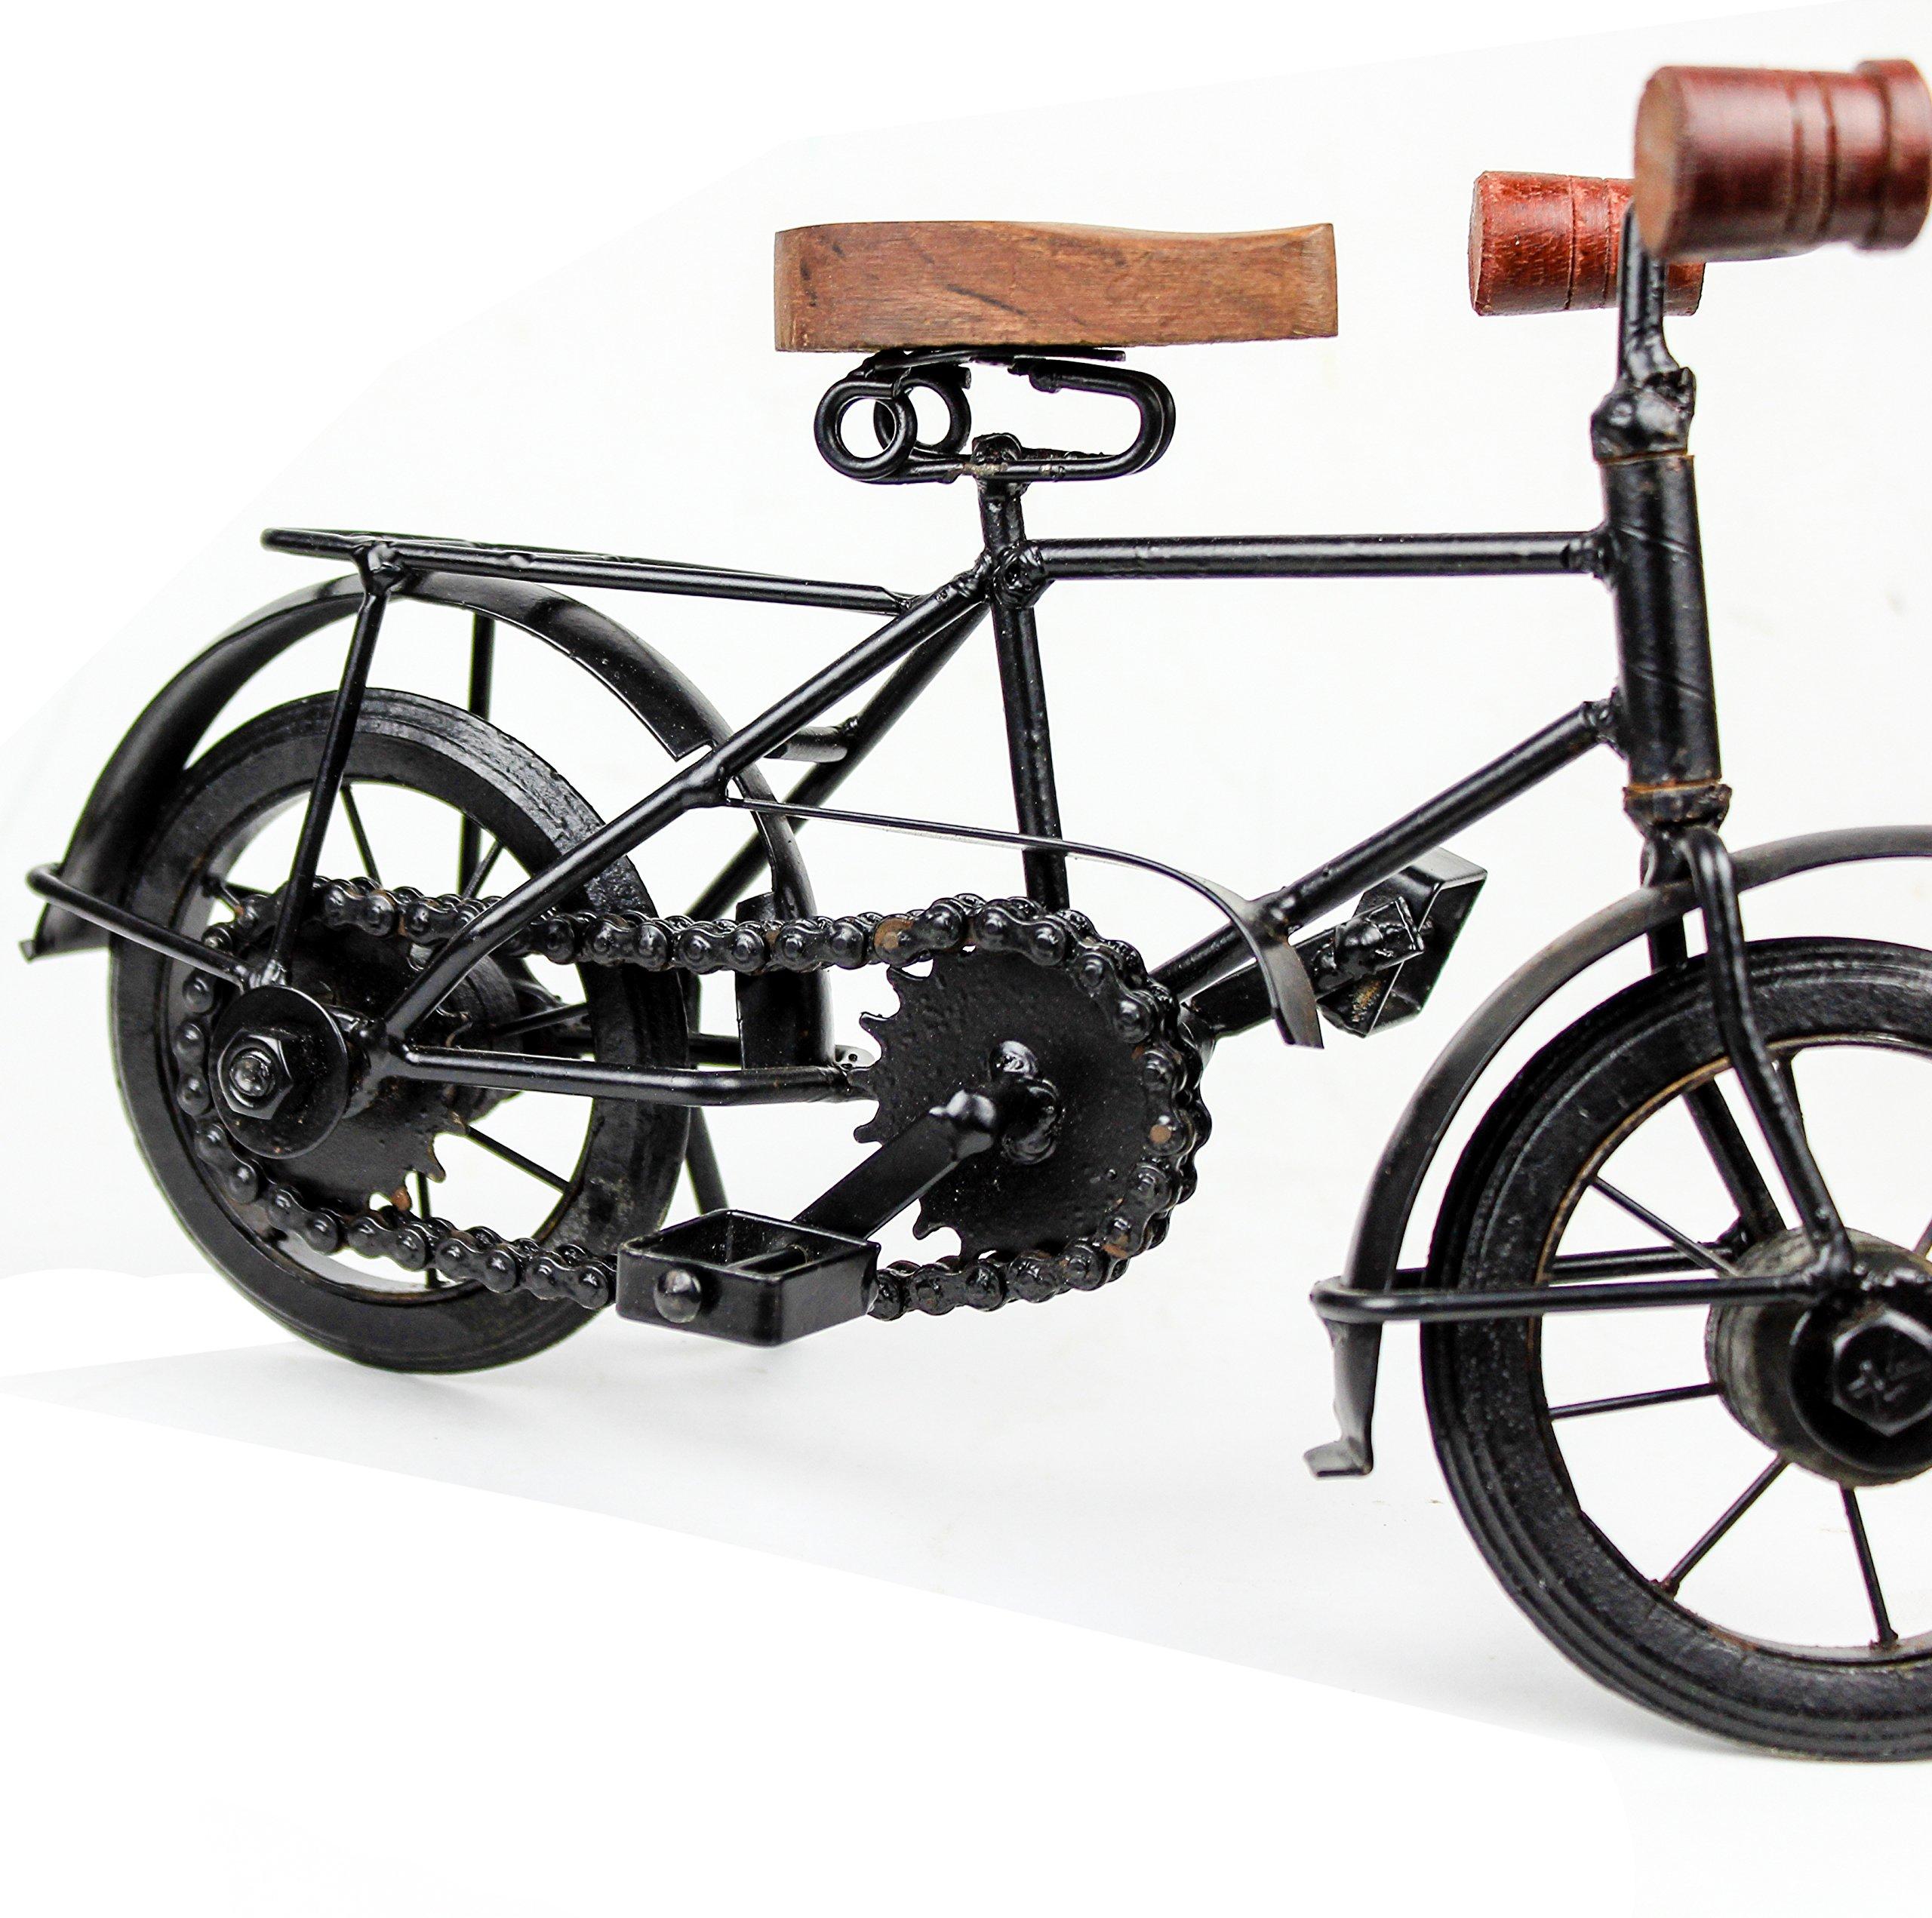 Nagina International Home Decor Iron Metal Crafted Beautiful Finger Bike   Table Decor Gifts Vehicle   Games Toy Cycle (Postman) by Nagina International (Image #3)